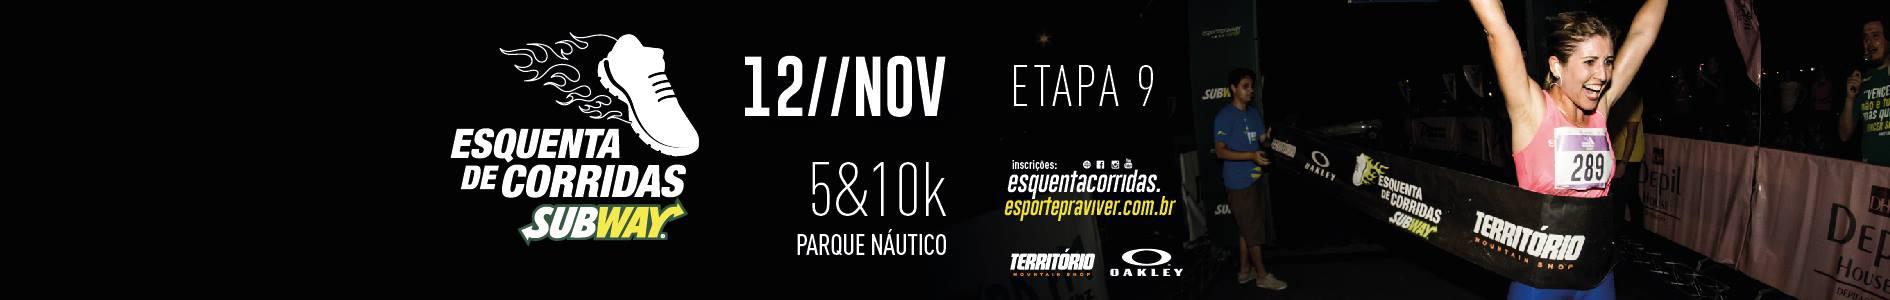 ESQUENTA CORRIDAS SUBWAY® - 9ª ETAPA - PARQUE NÁUTICO - Imagem de topo